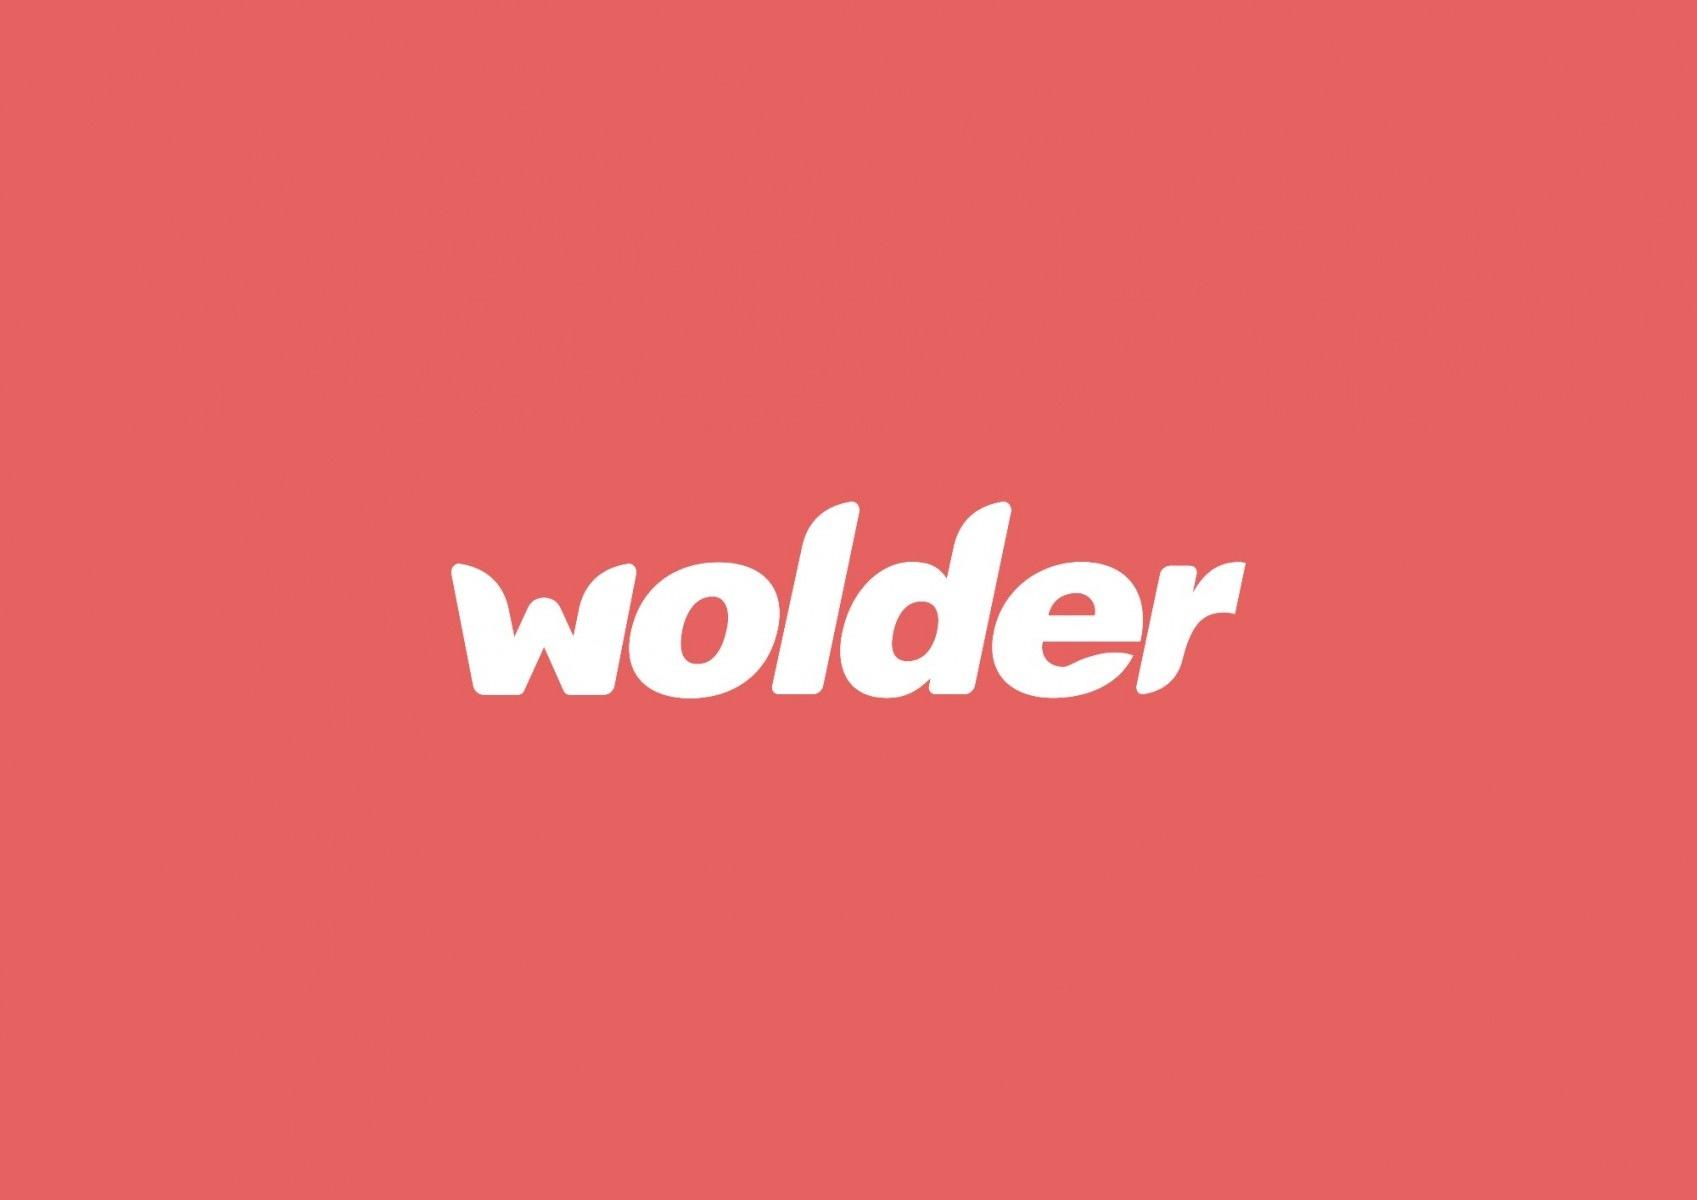 Wolder logo